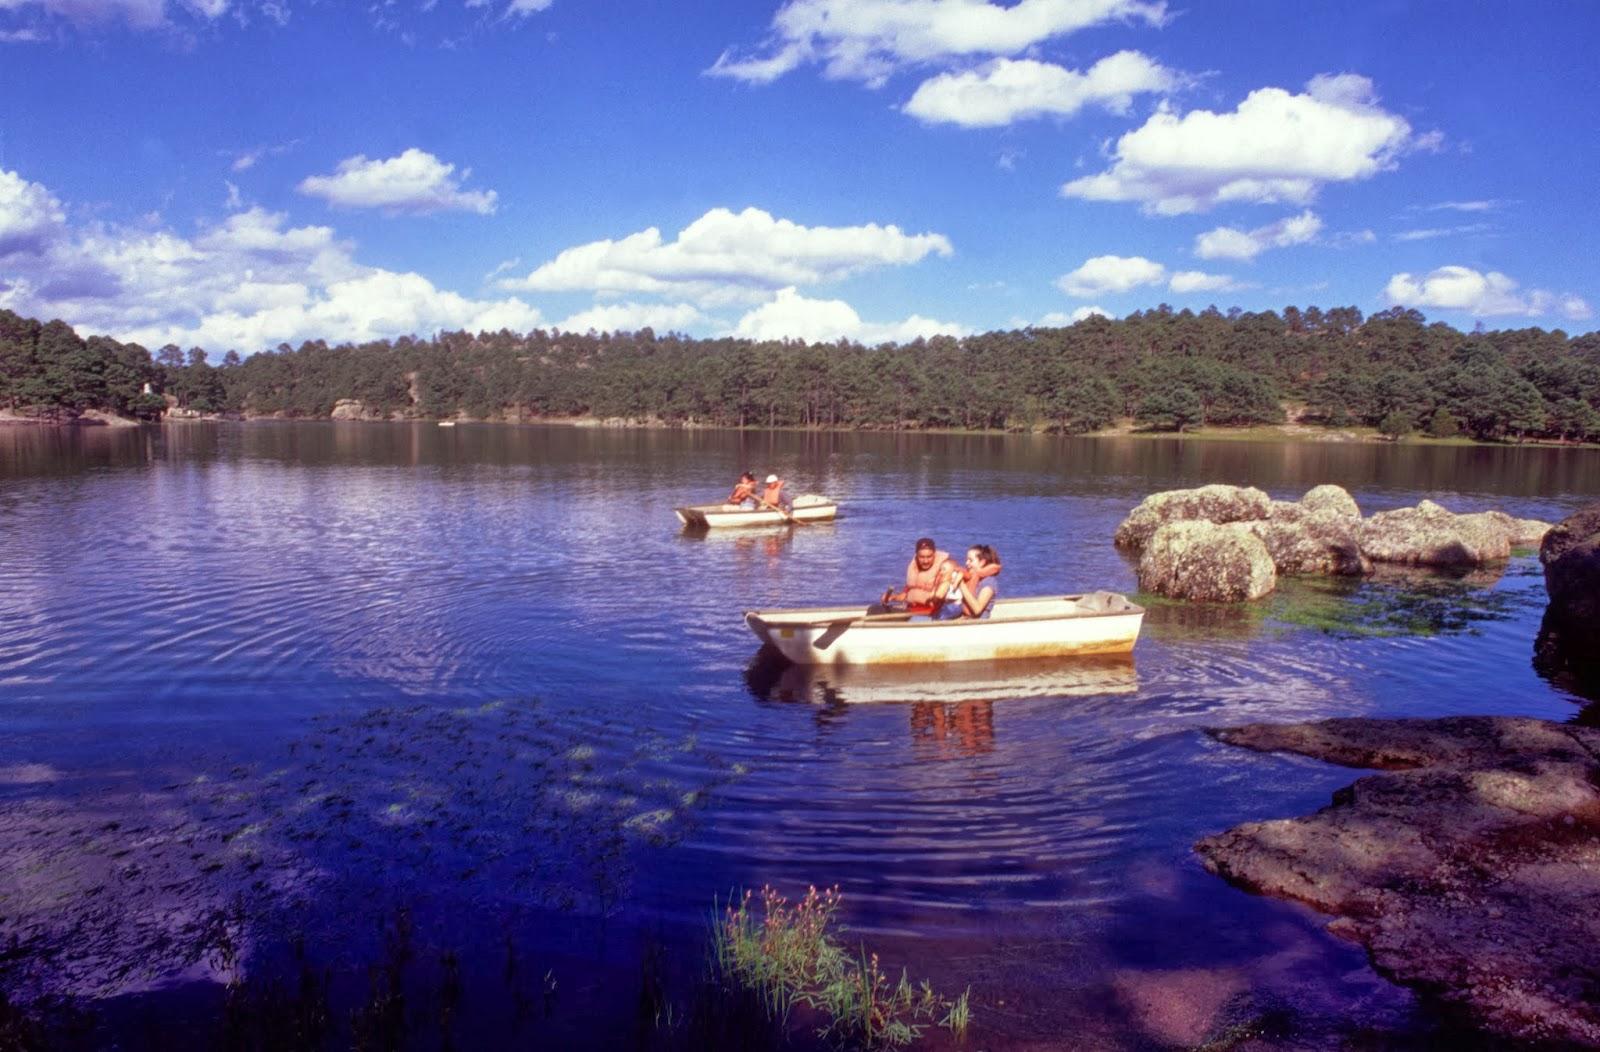 Mejor temporada Lago Arareko - Chihuahua